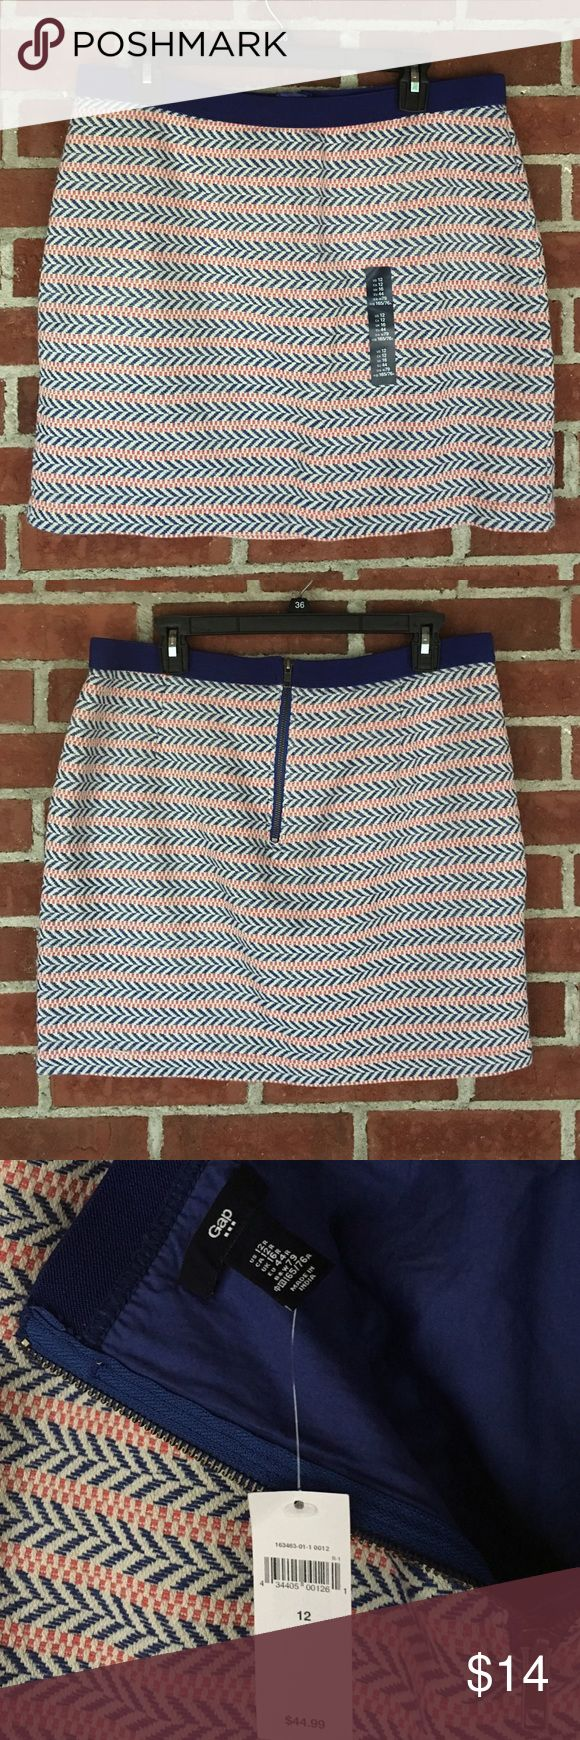 Gap Skirt Blue and orange aztec print skirt by Gap. Size 12 GAP Skirts Mini